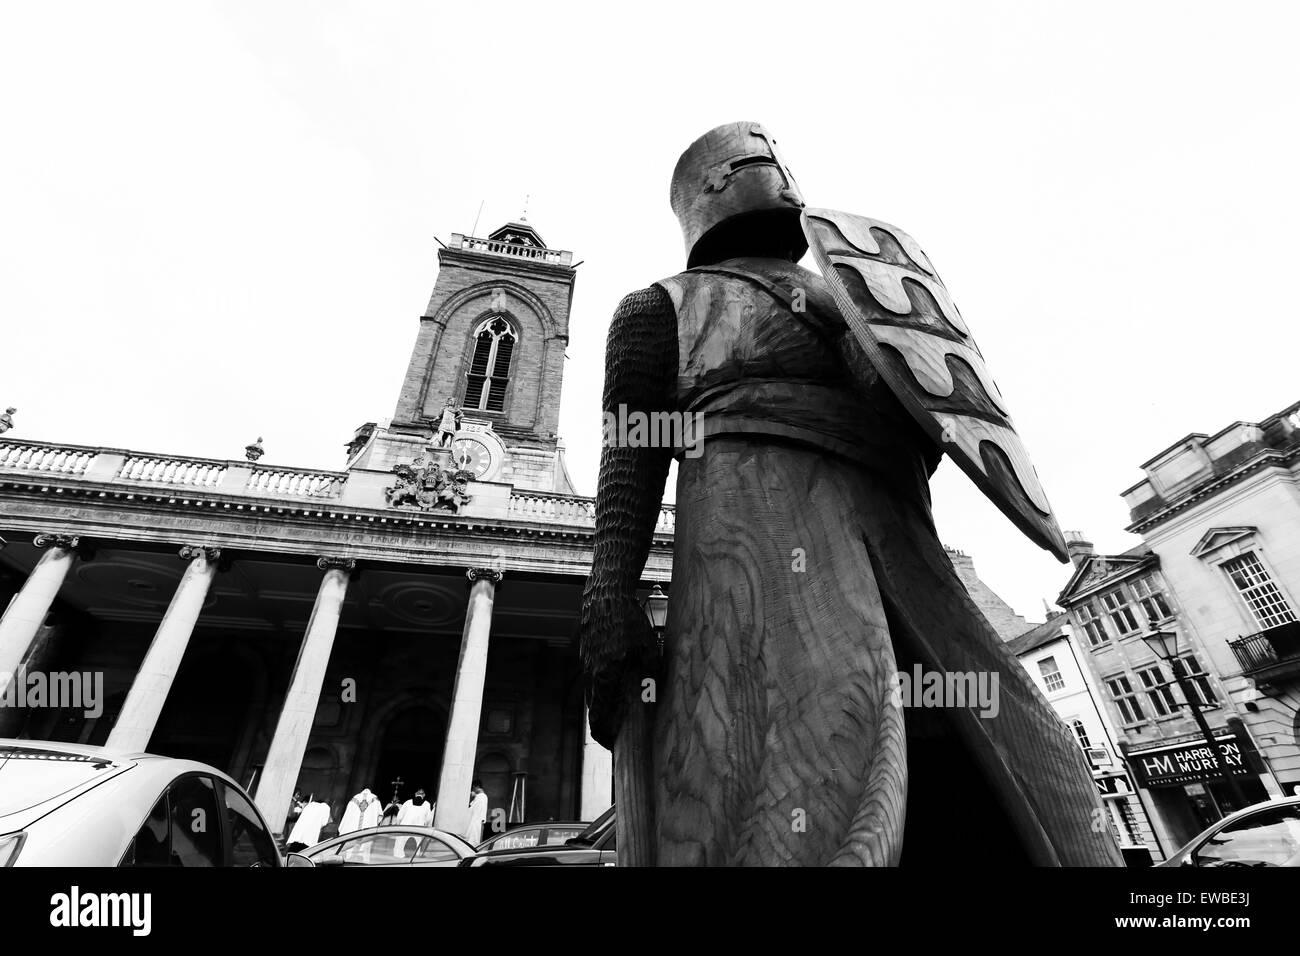 All Saints Northampton - Stock Image